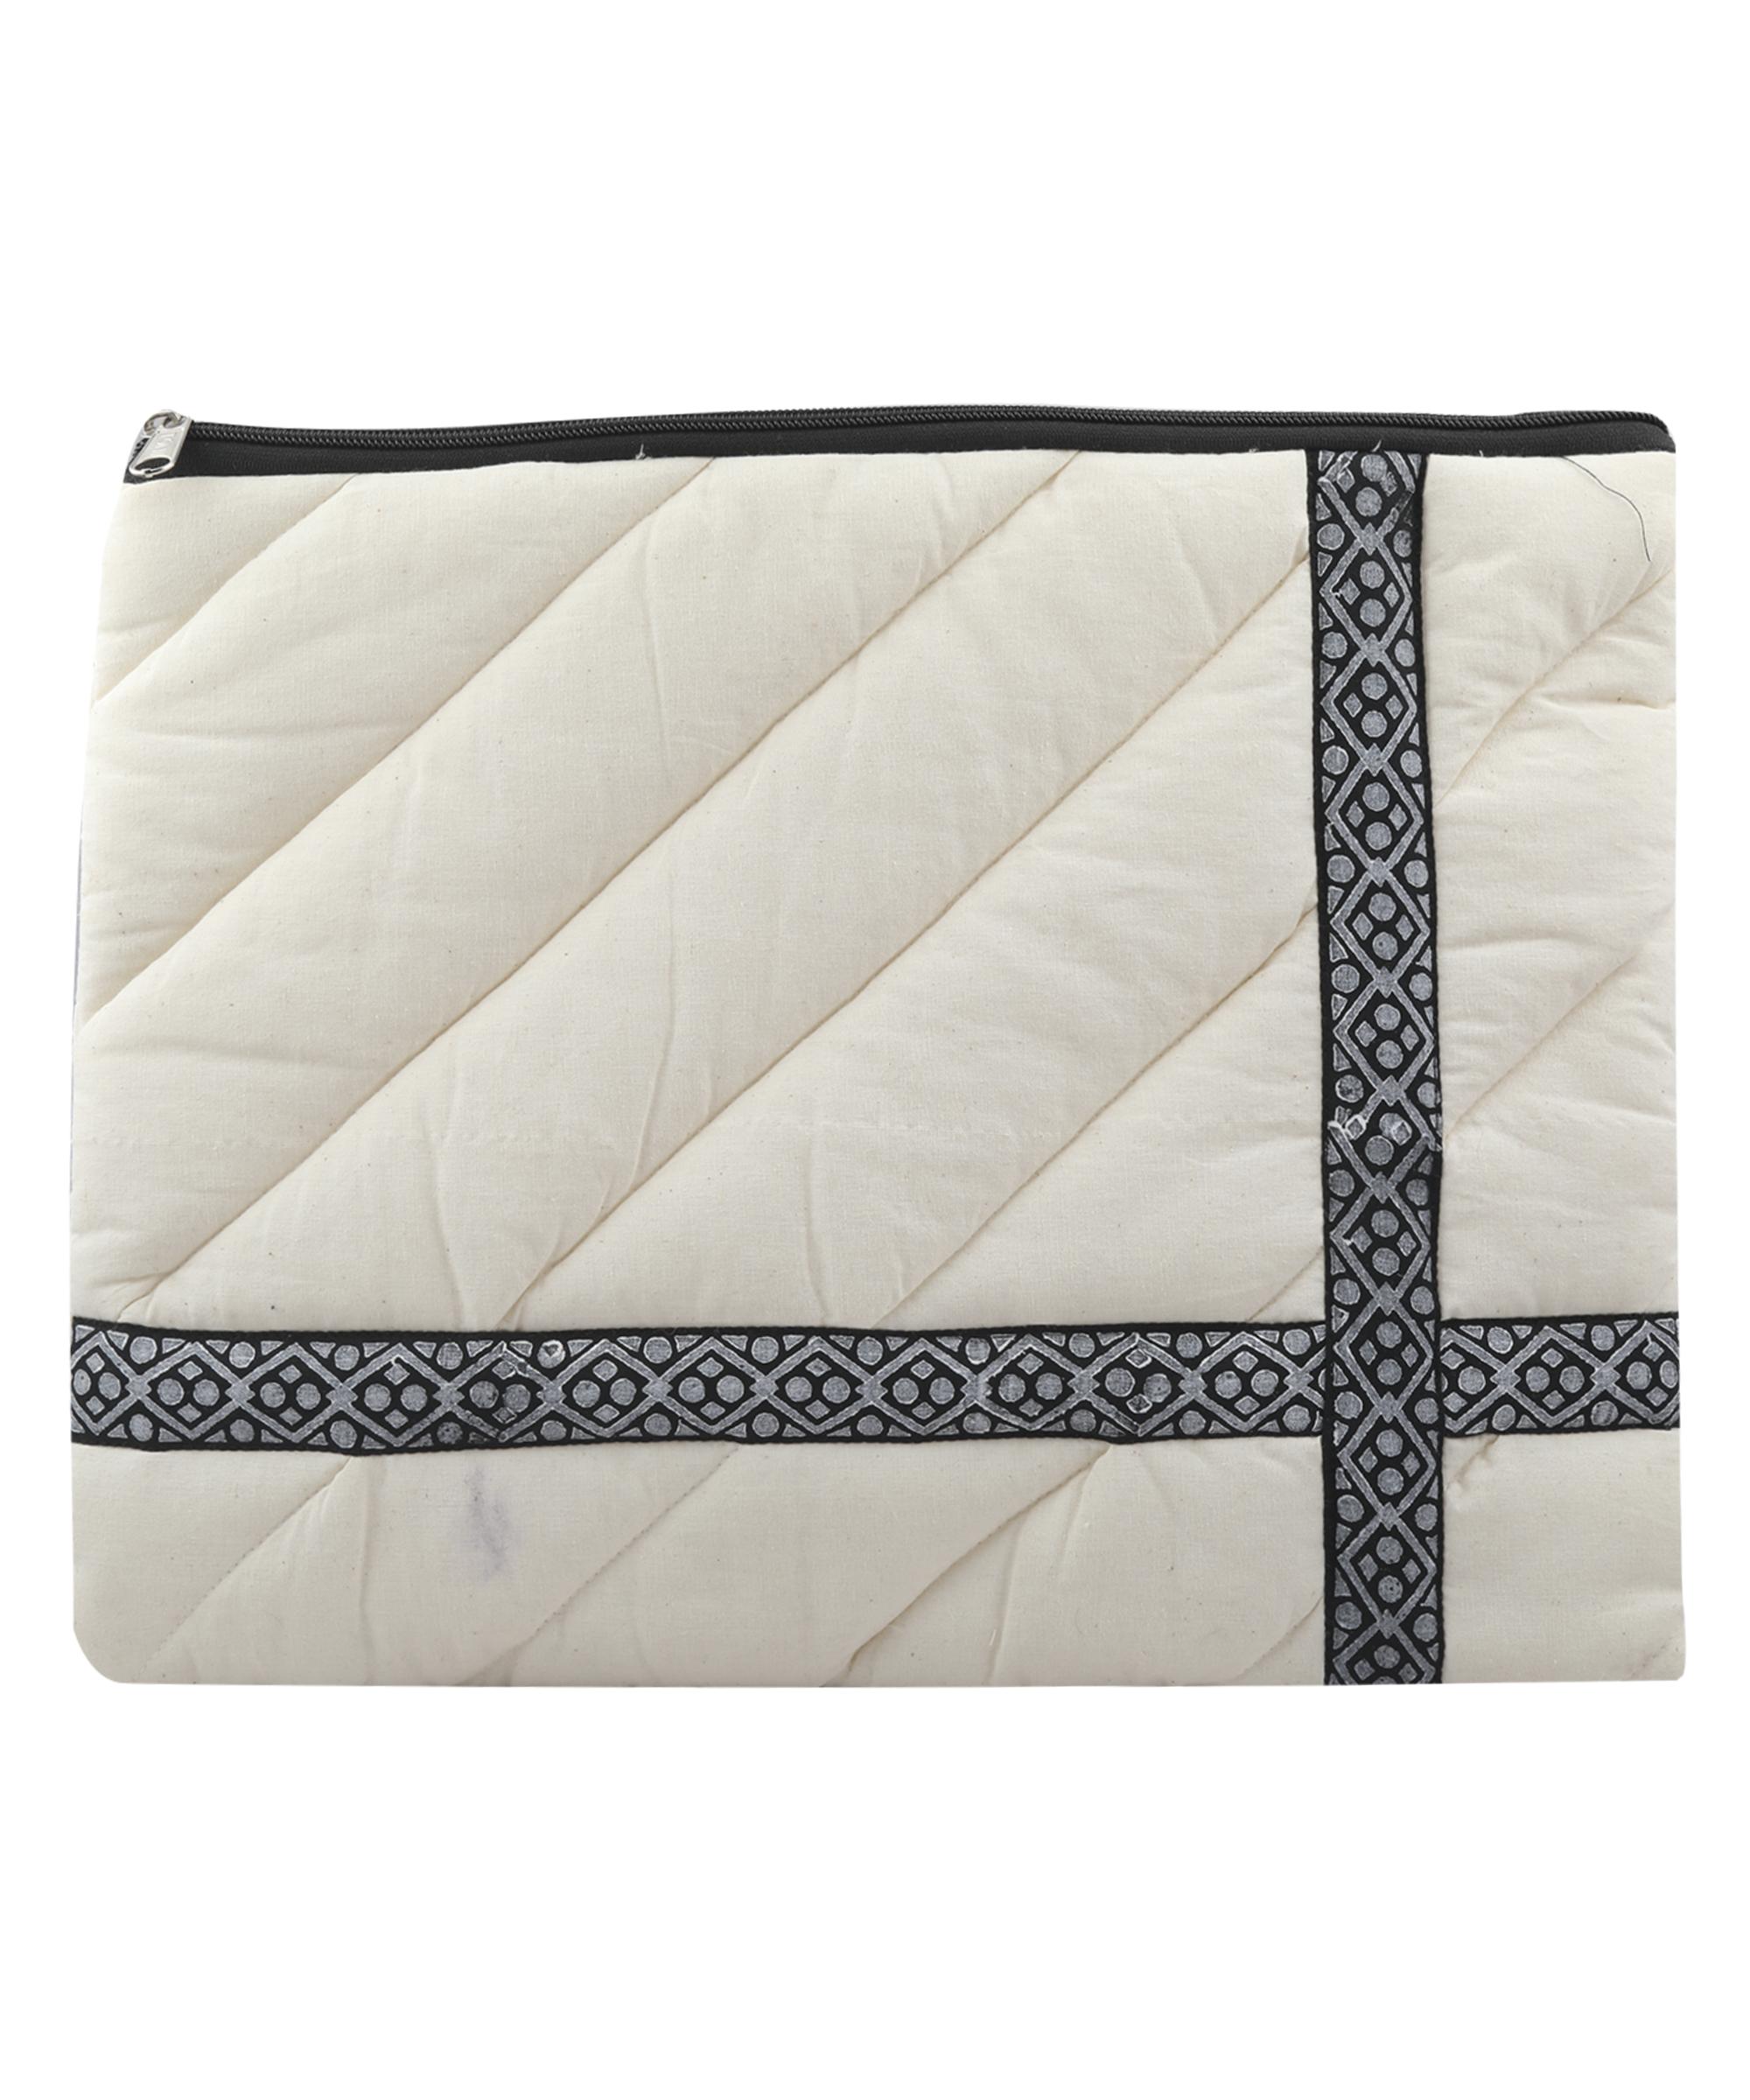 "Handmade block printed Laptop Sleeve, Kora Cotton, 16""x12"" for Laptop/Tablet/MacBook Slider Thumbnail 2/4"